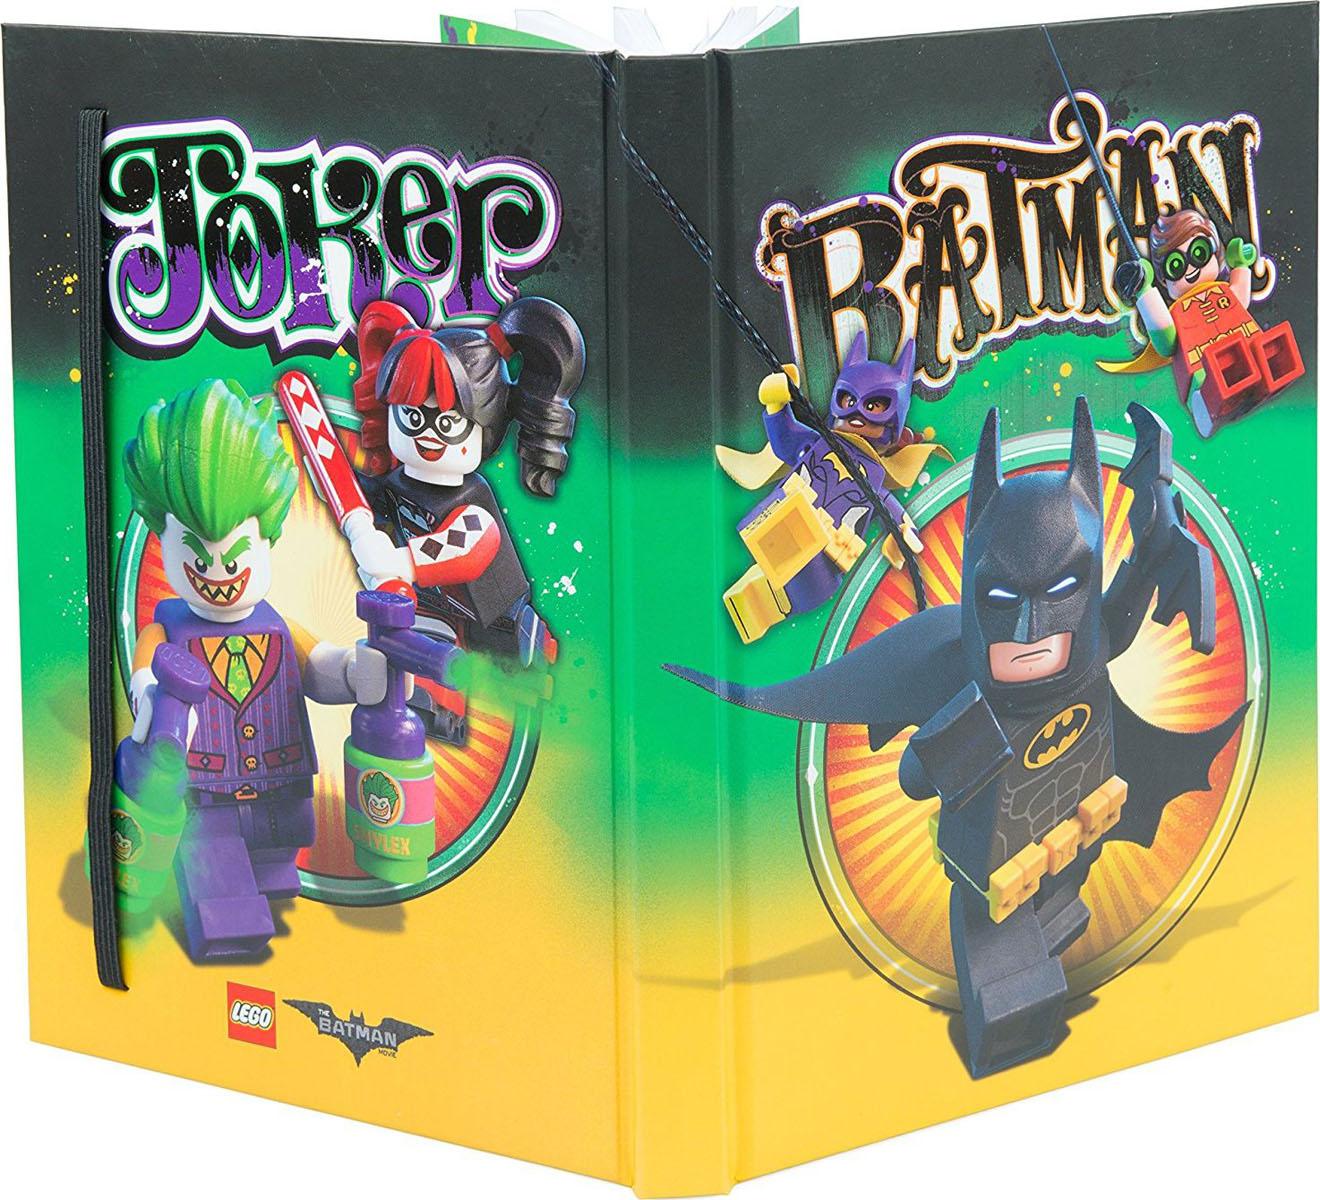 LEGOНабор канцелярских принадлежностей Batman Movie 12 предметов